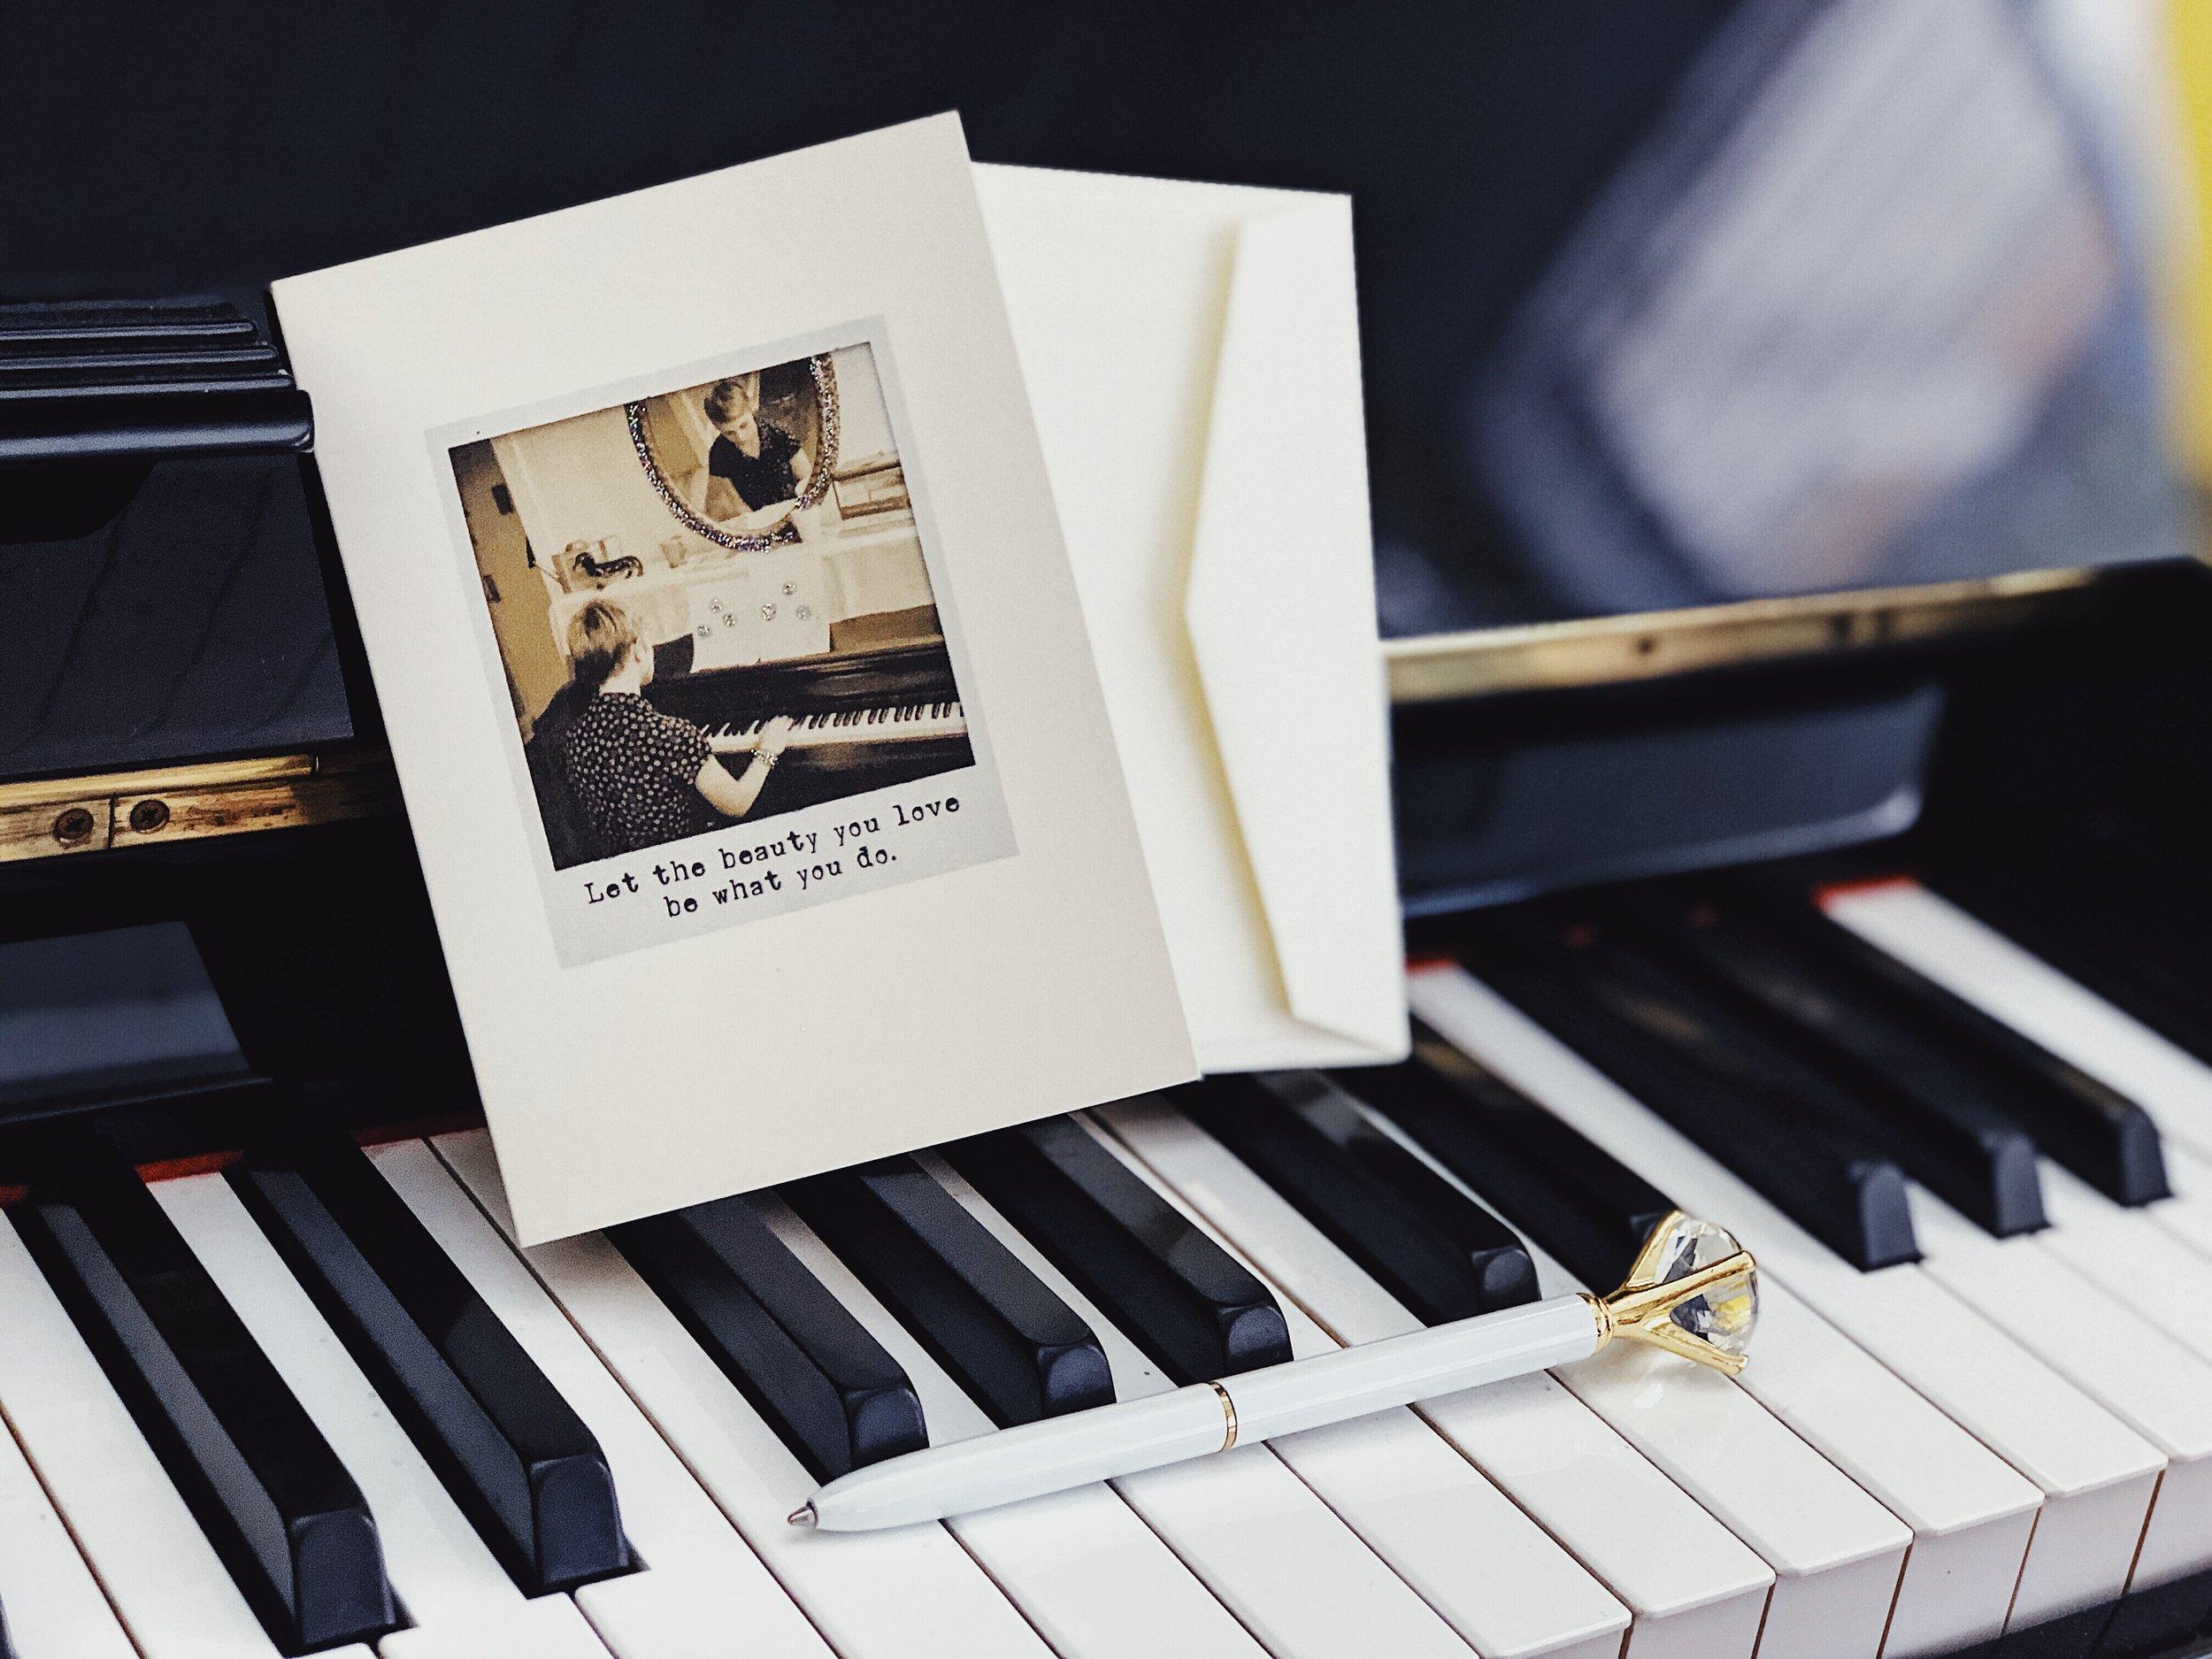 kat-edmonson-sparkle-and-shine-card-set-keyboard-styled.JPG